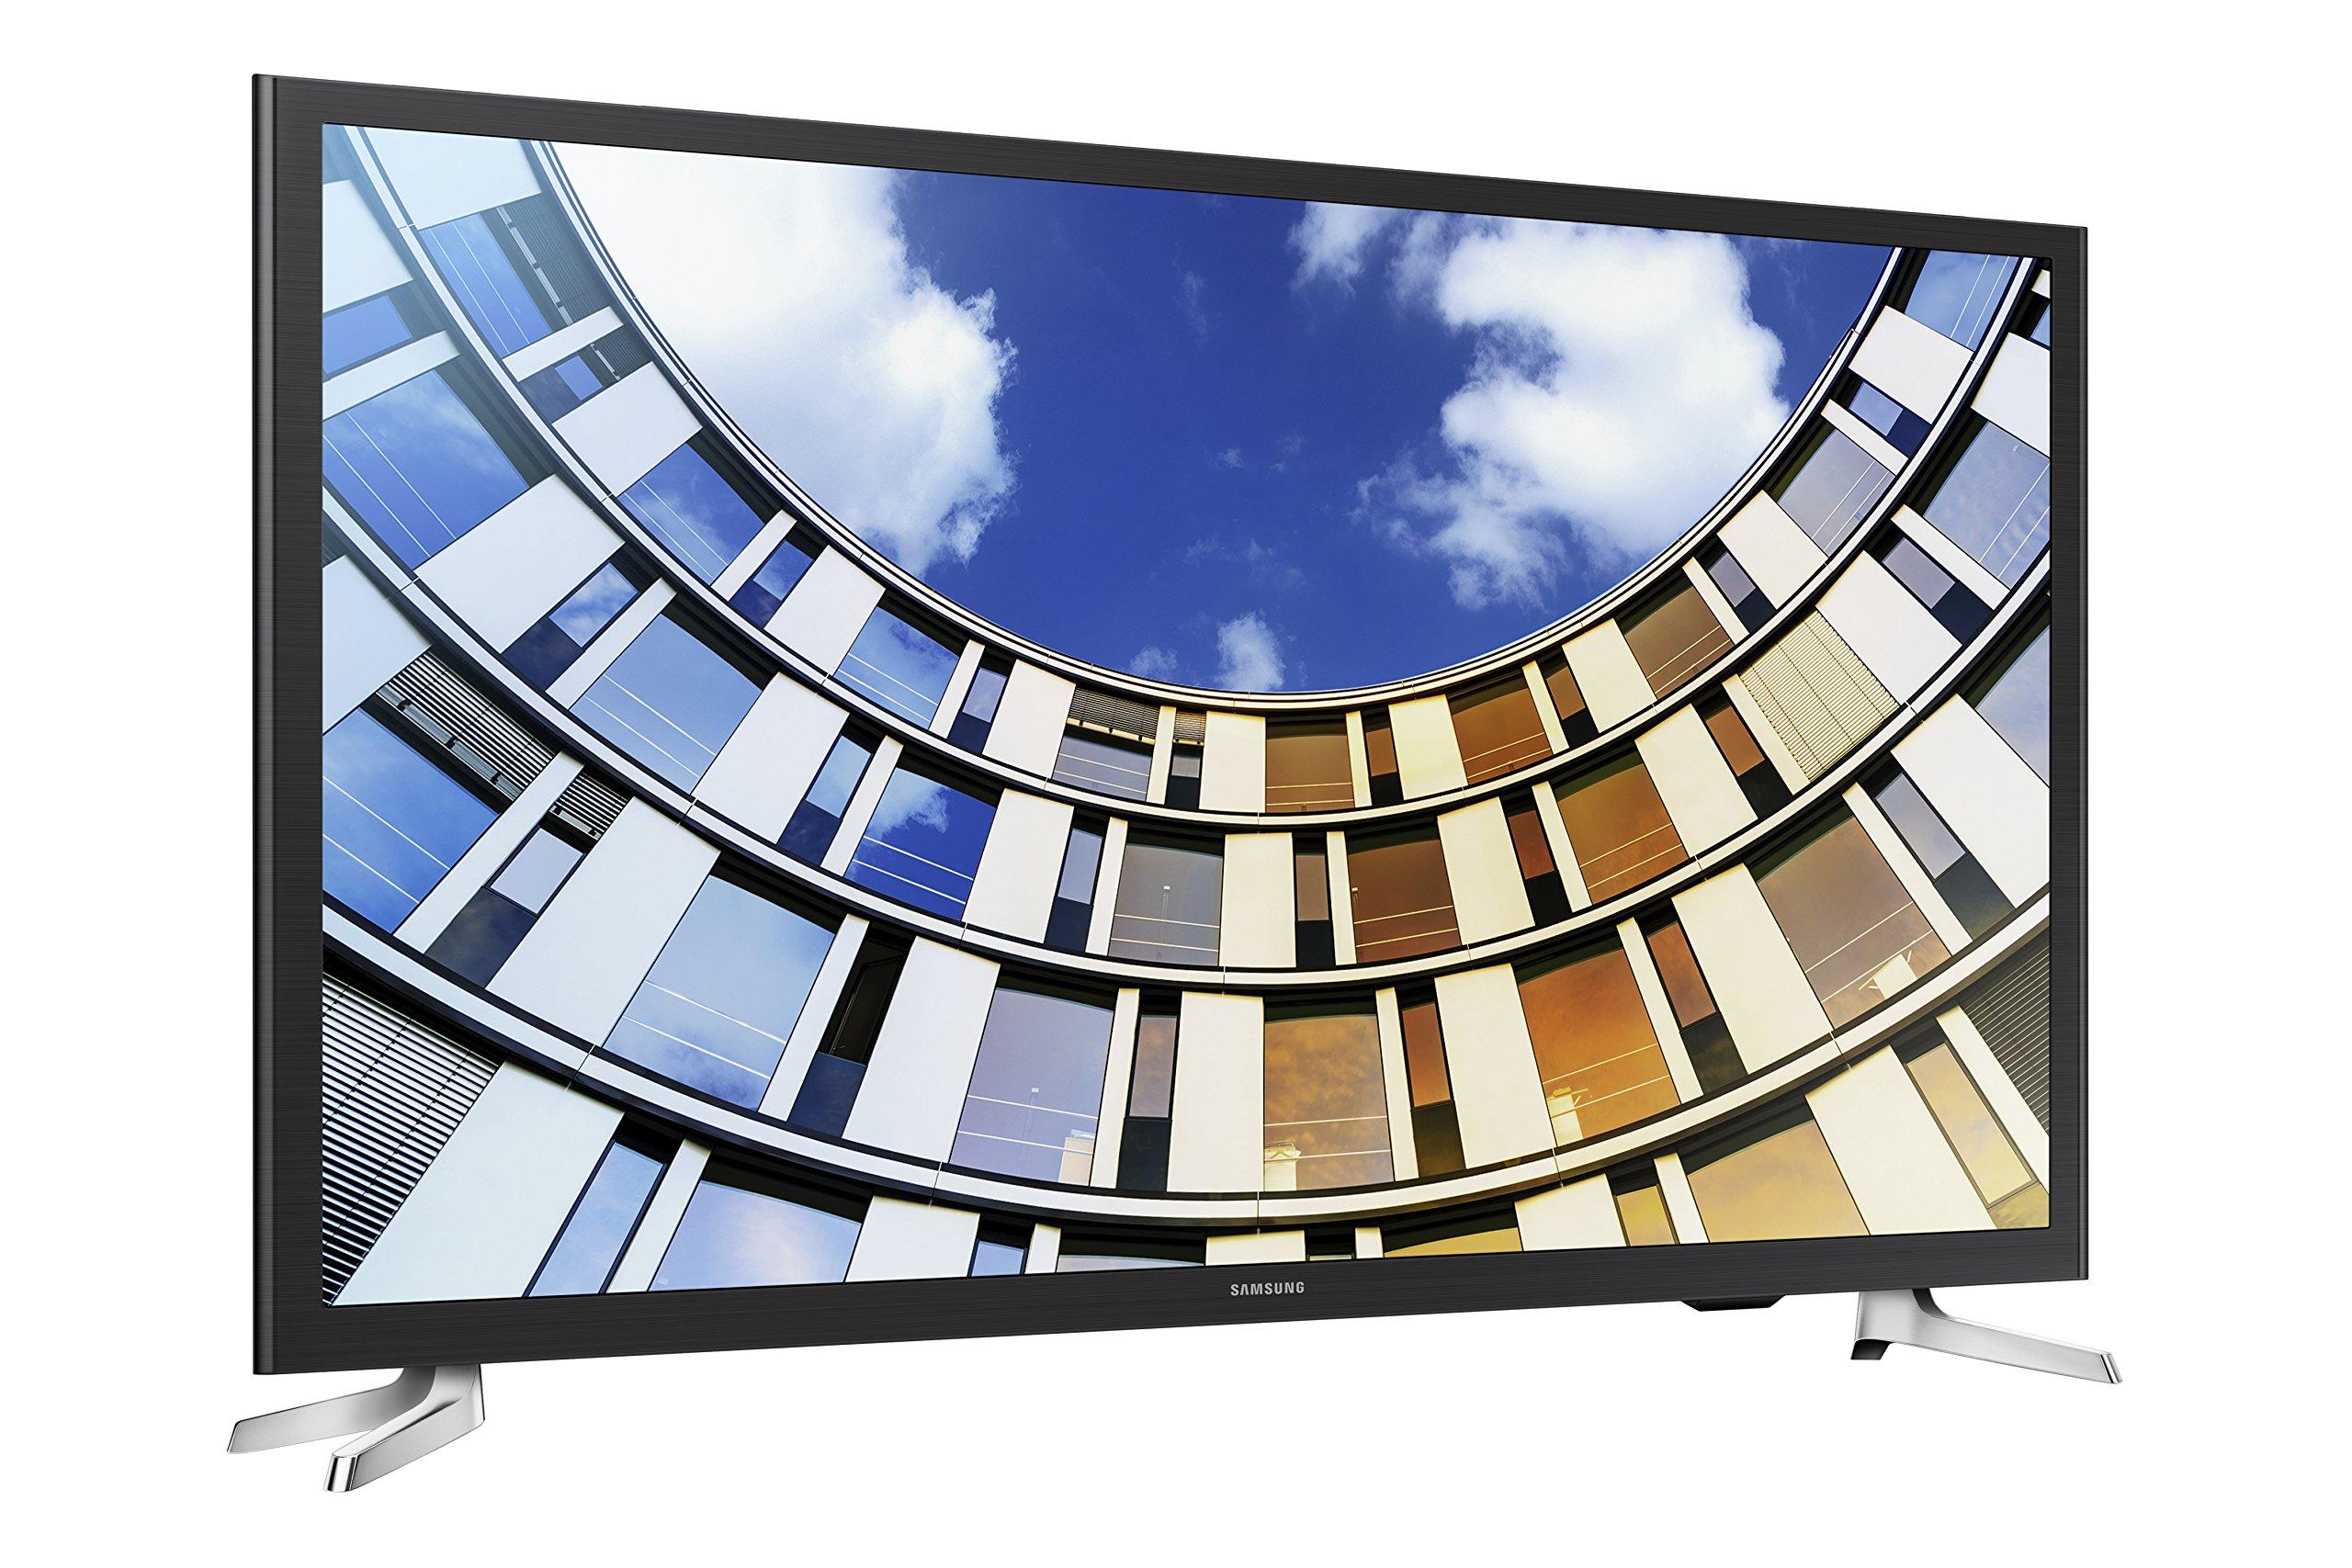 Samsung Electronics UN40M5300AFXZA Flat LED 1920 x 1080p 5 Series SmartTV 2017 3